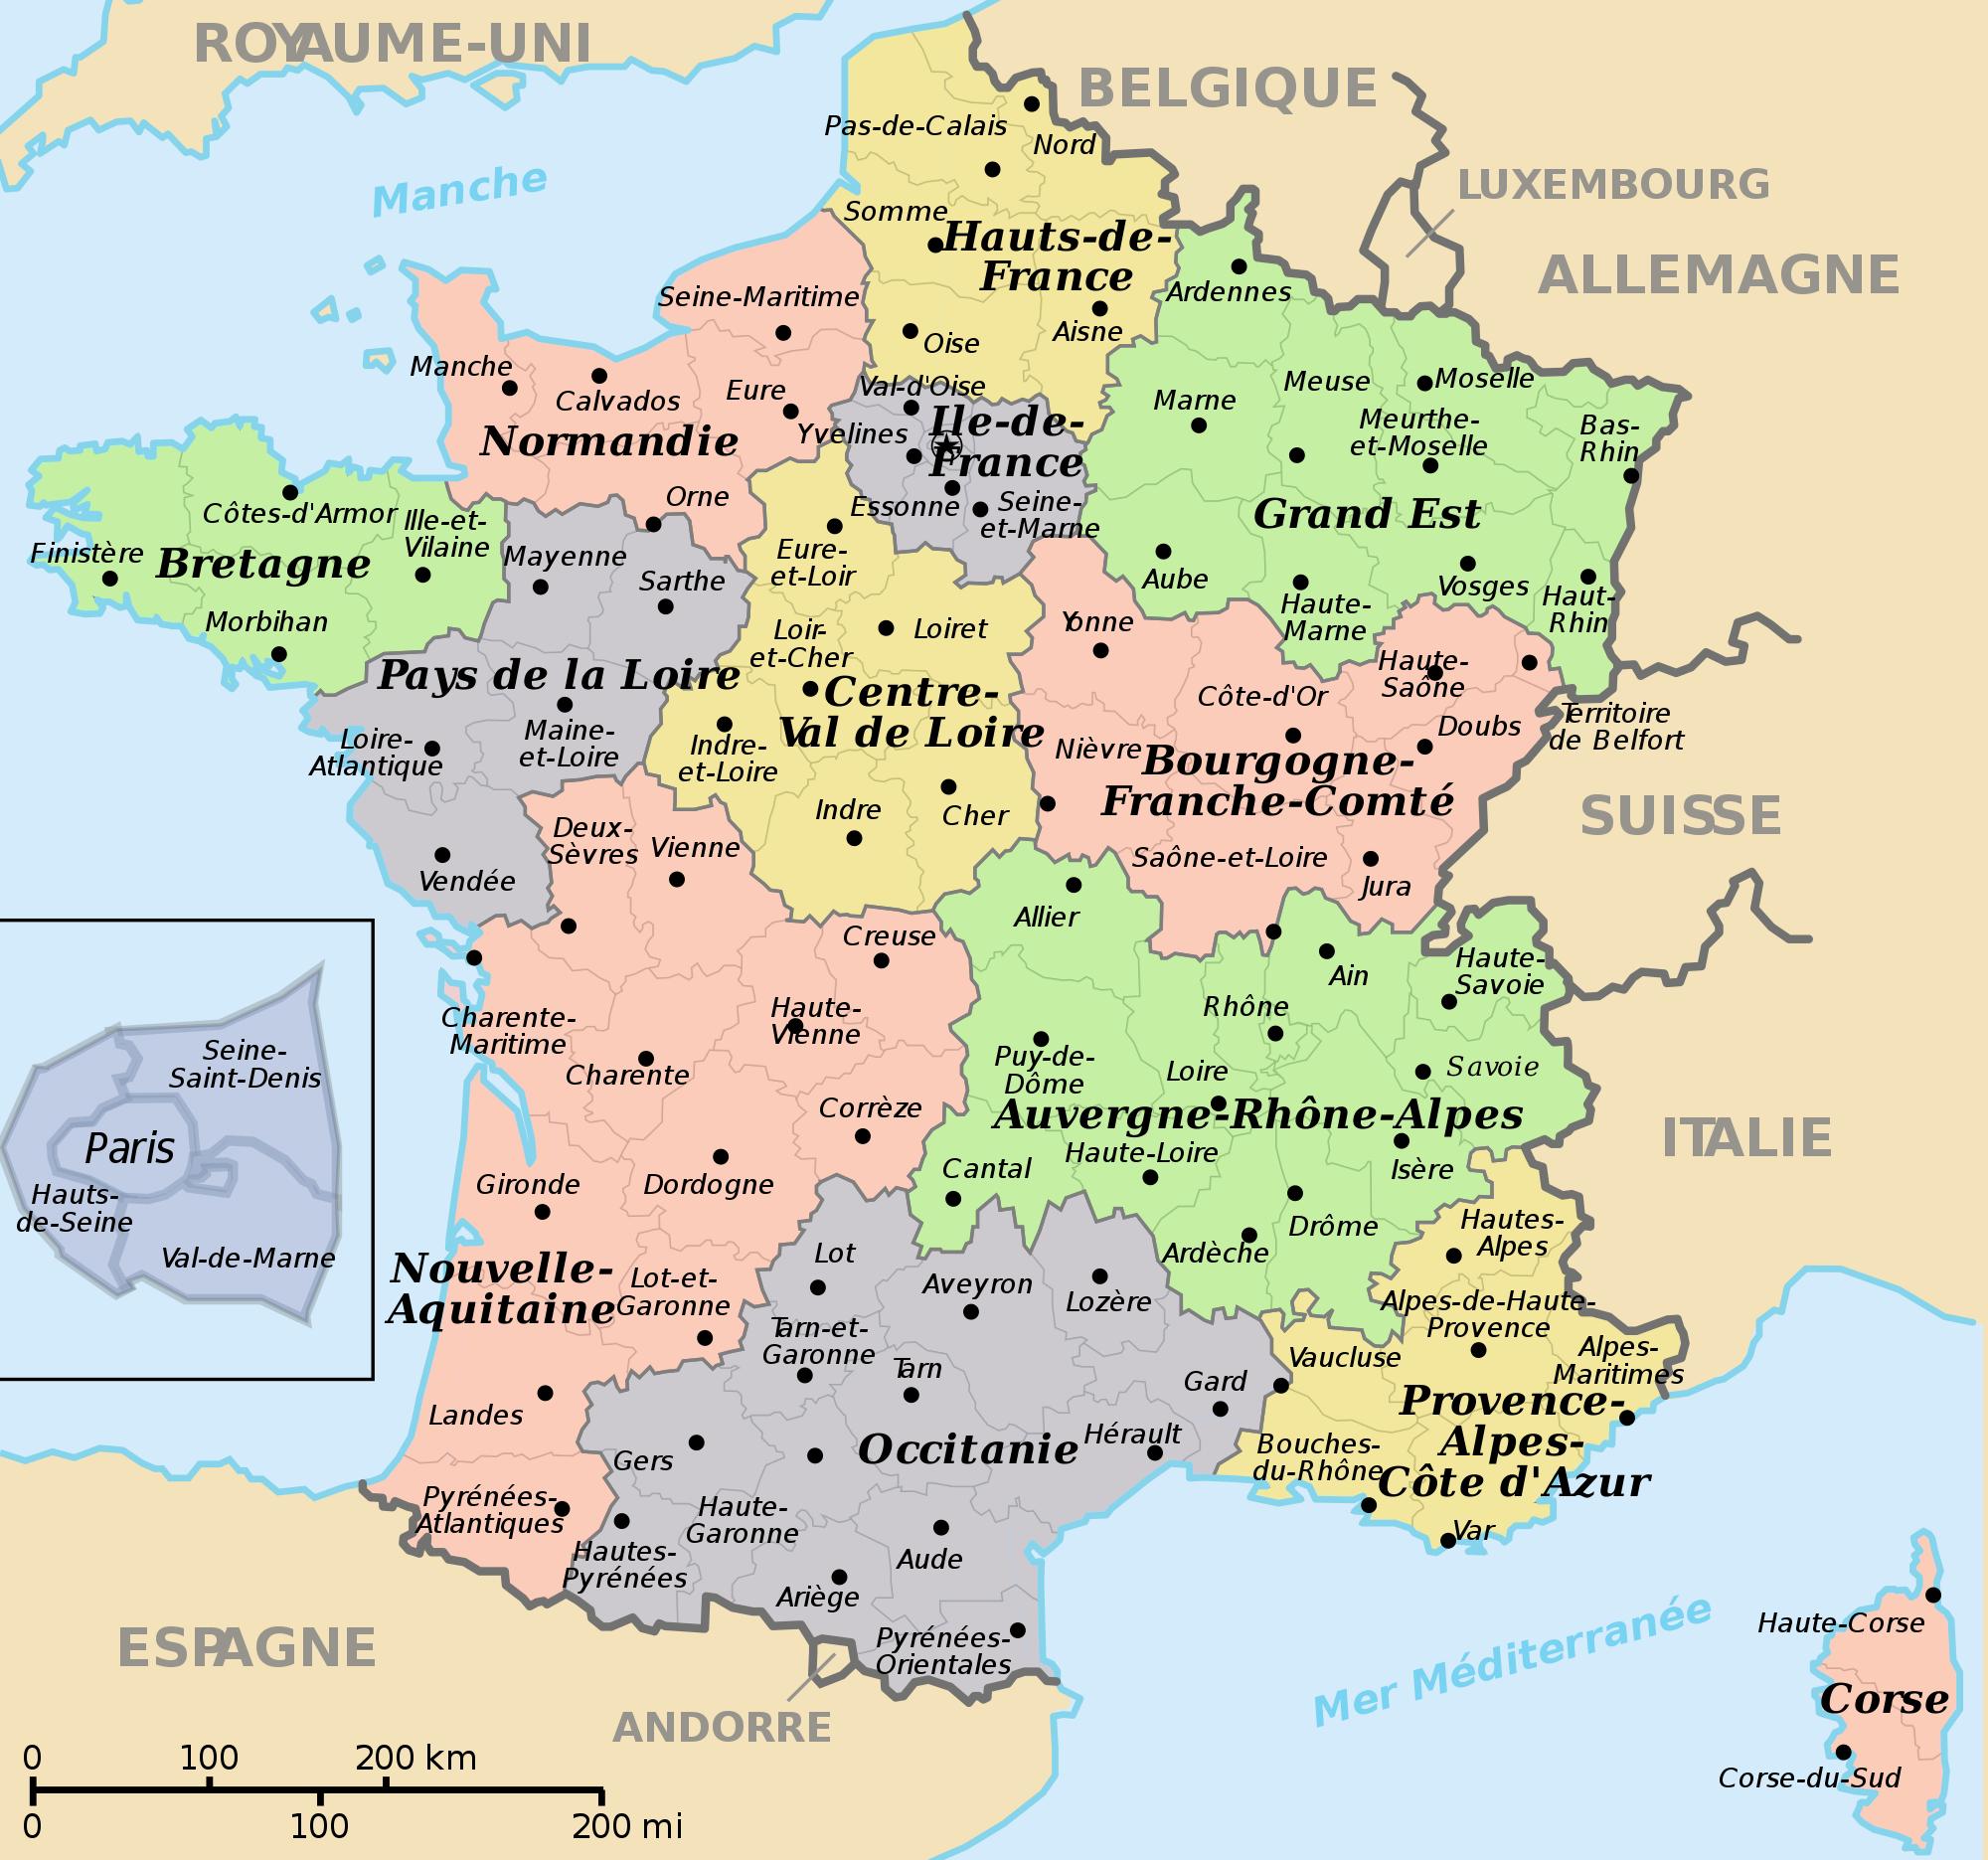 frankrikes regioner frankrike och dess regioner region uppt ck frankrike och dess regioner. Black Bedroom Furniture Sets. Home Design Ideas